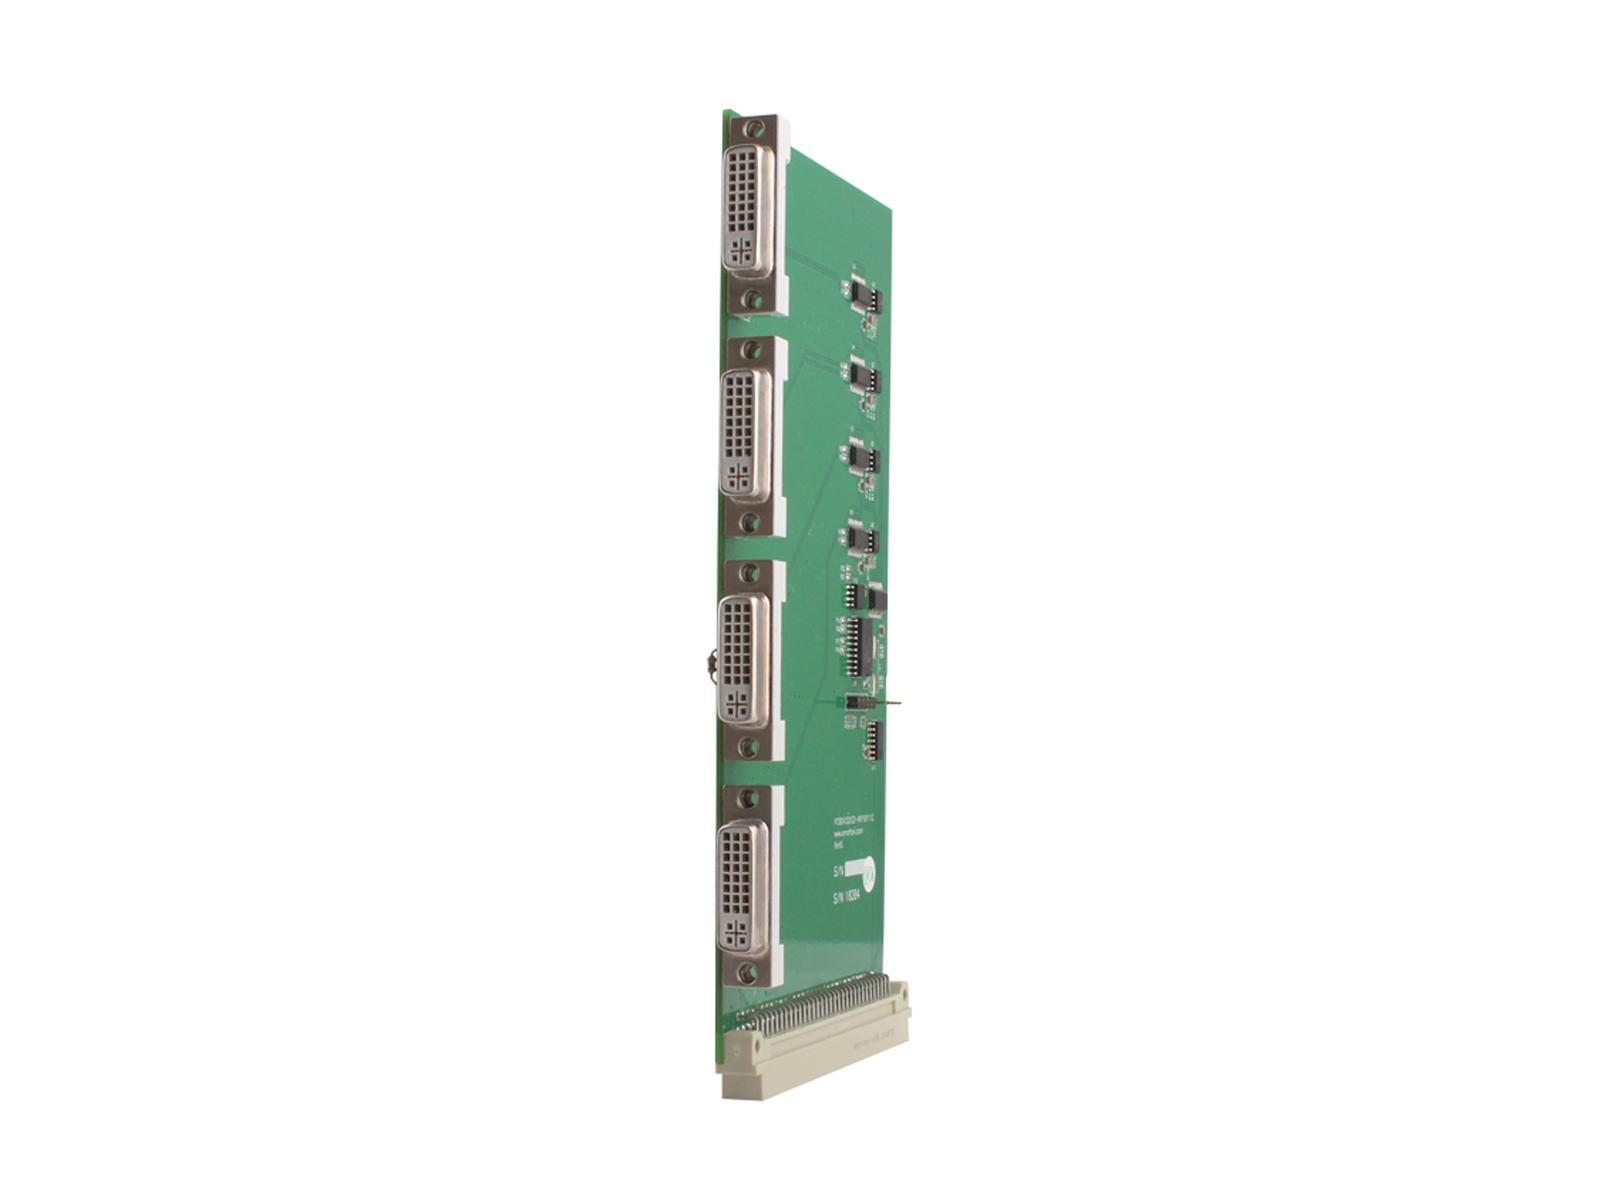 MXC-UD4PI 4-Port DVI-D Input Card for MXCORE-UD by Smartavi